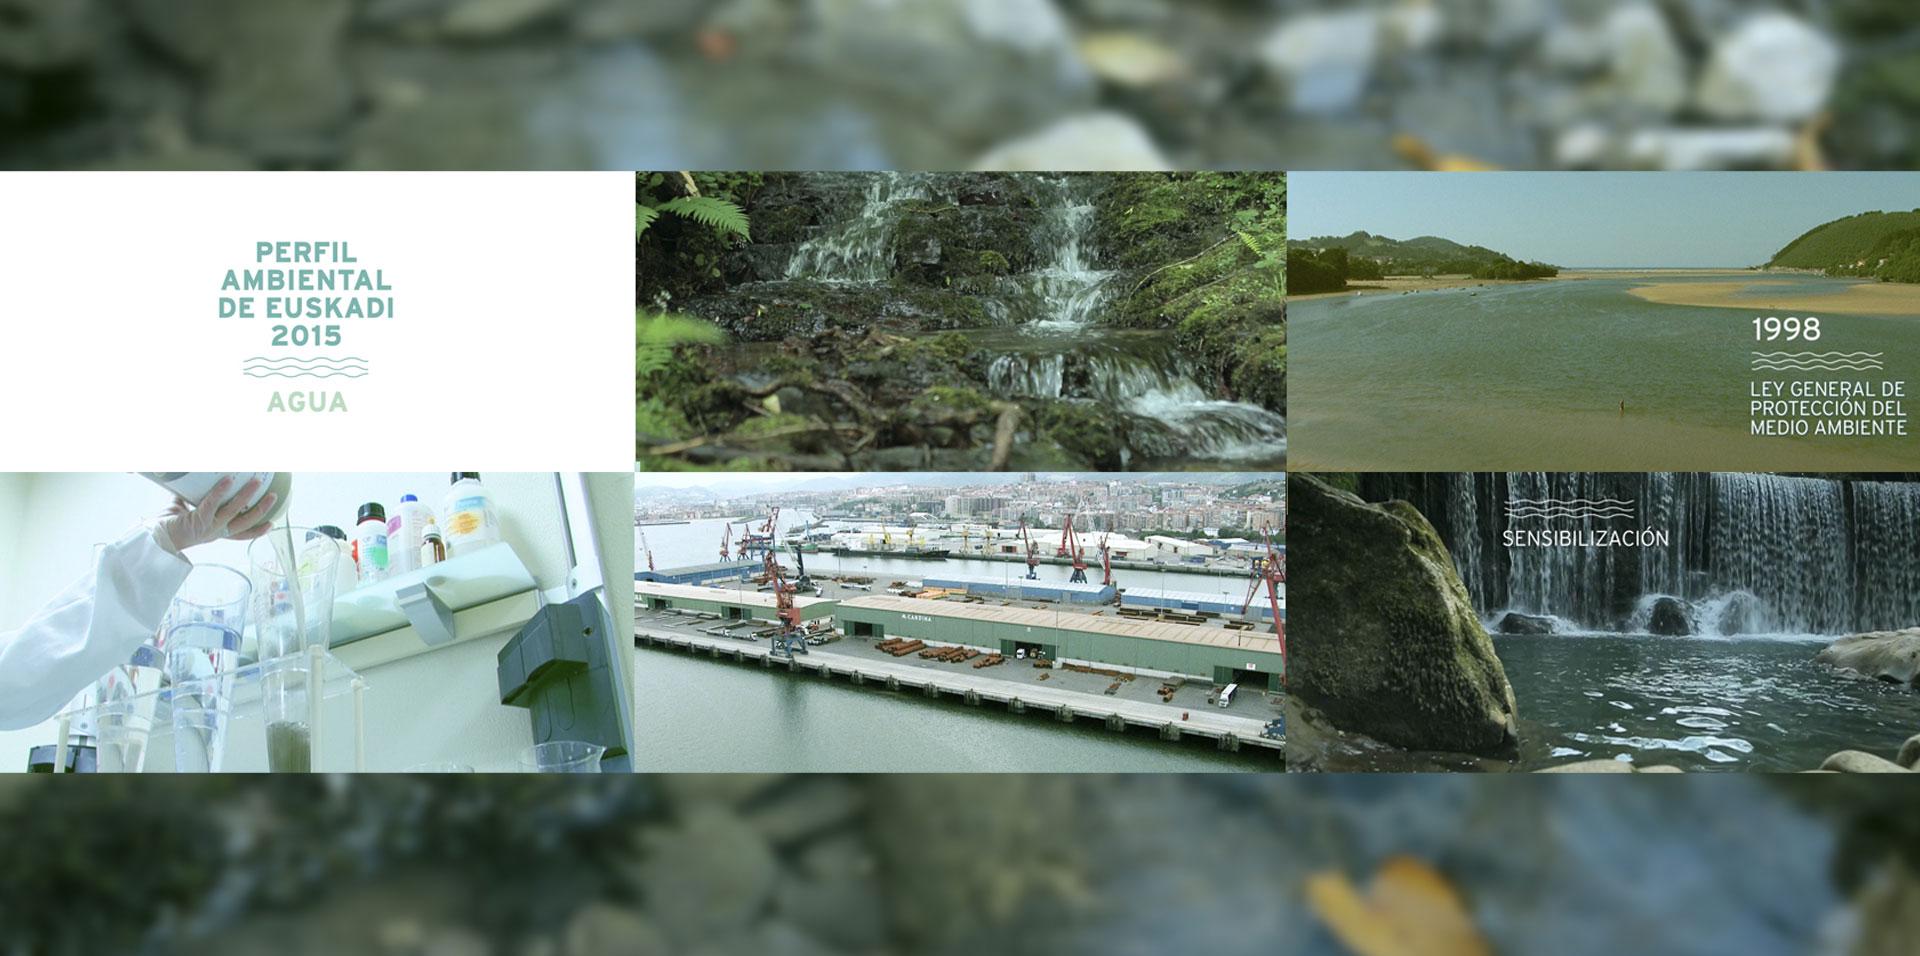 Video Perfil Ambiental del Agua en Euskadi 2015